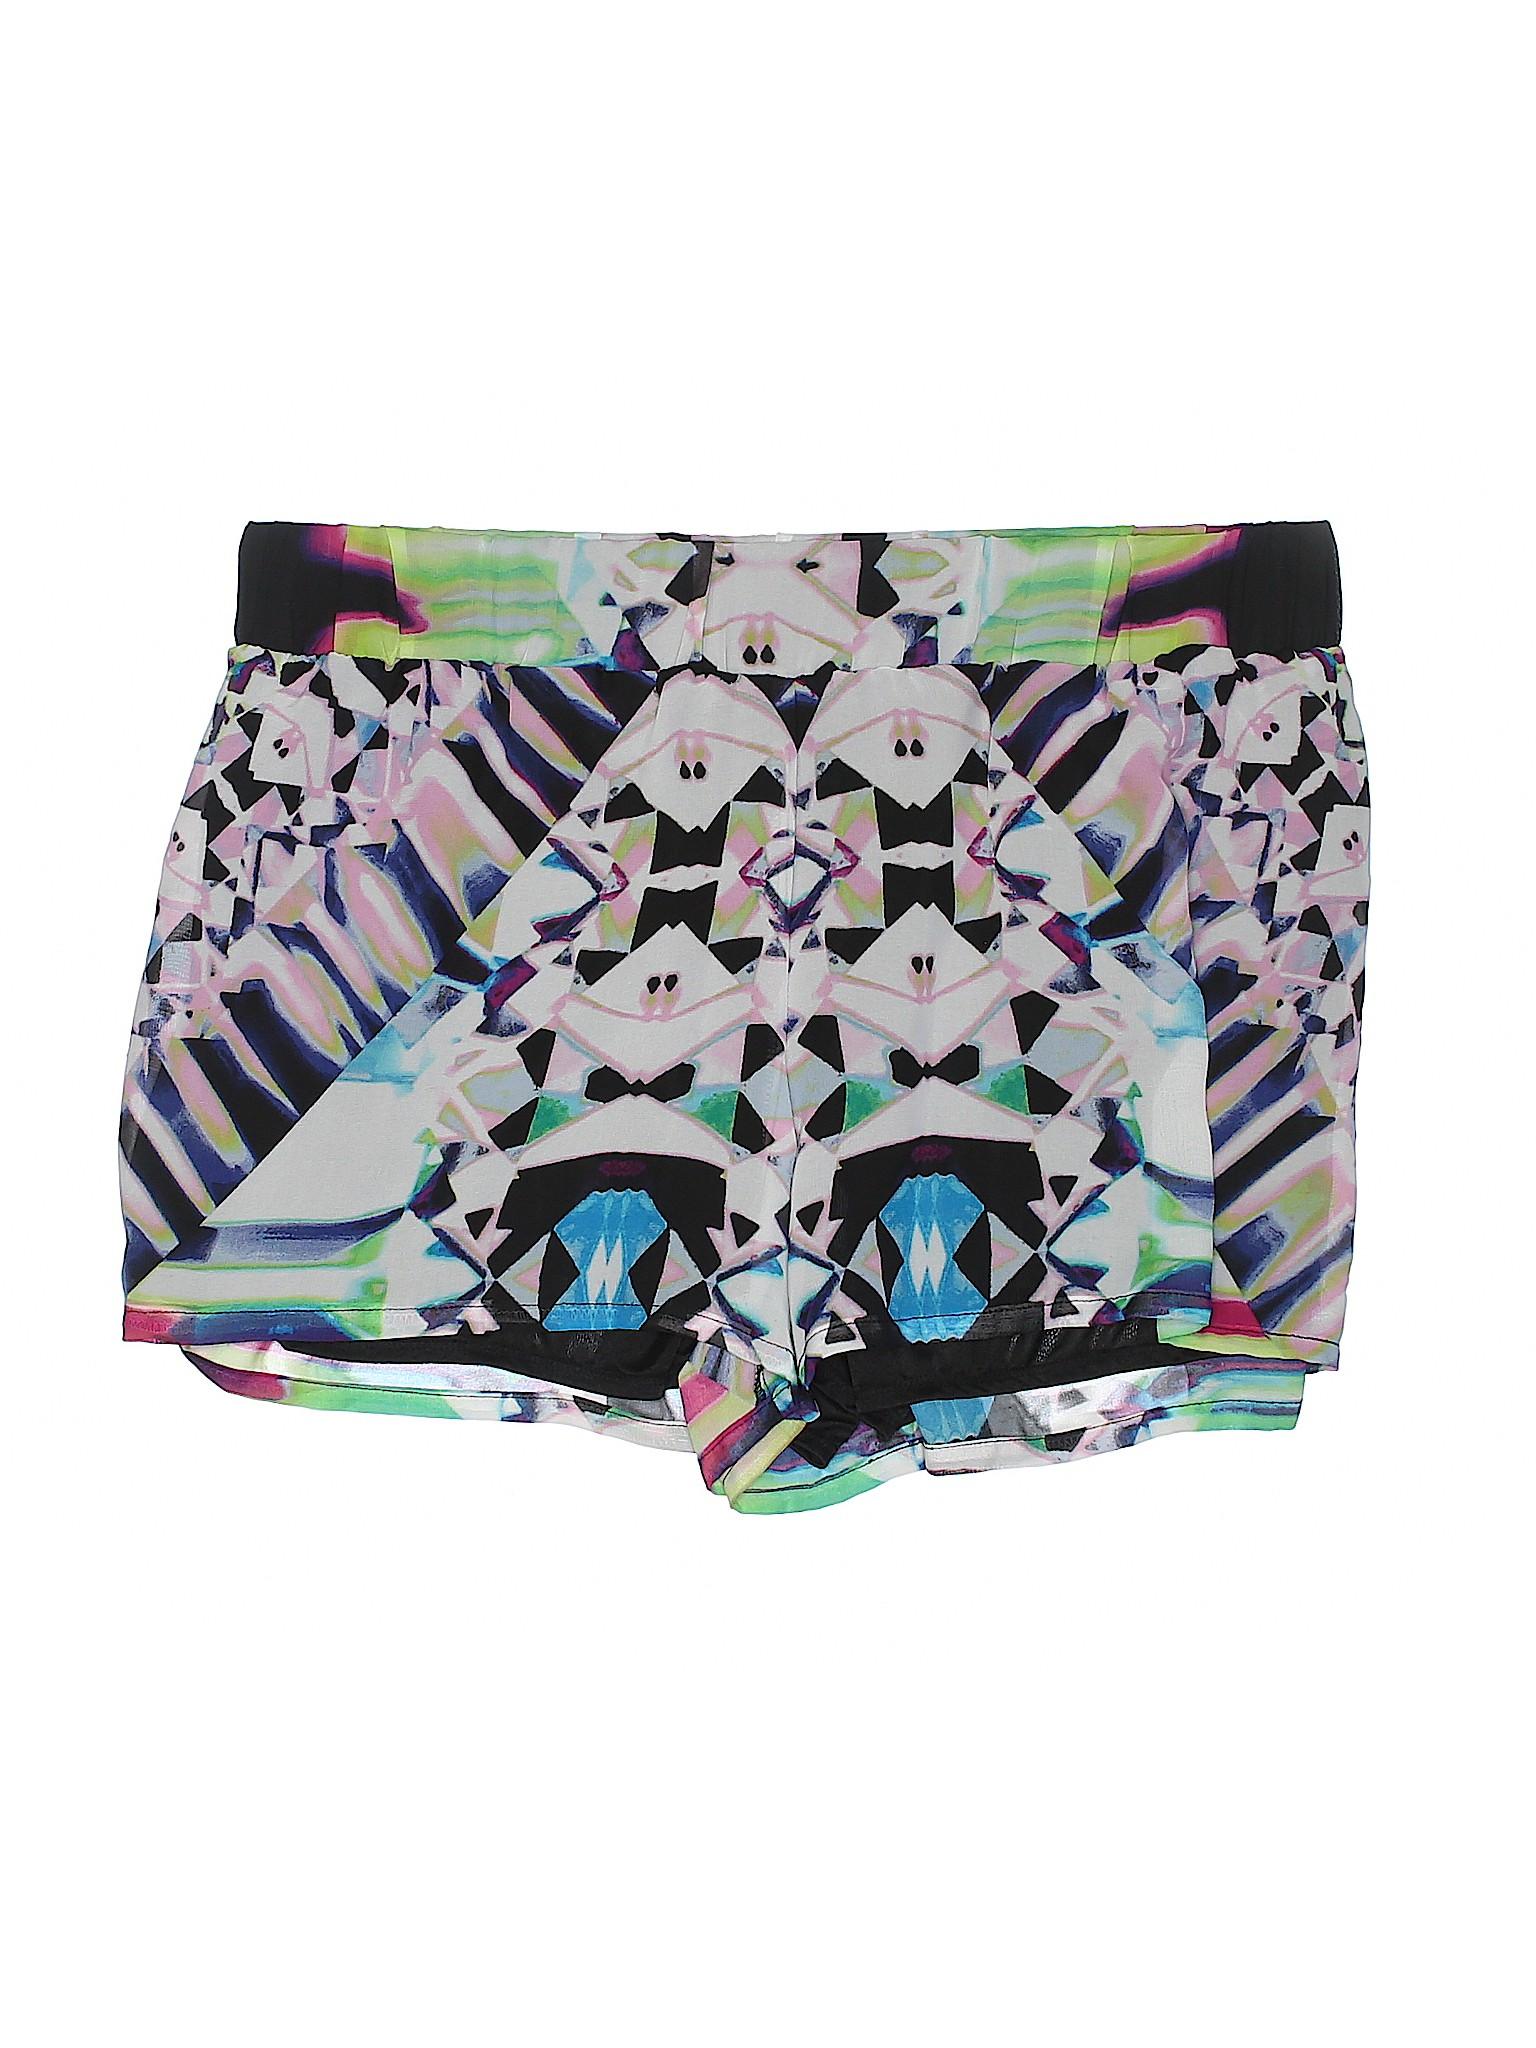 Shorts Boutique Bisou Boutique Bisou Bisou Bisou Bisou Shorts Boutique Bisou ZqdCxwnz7